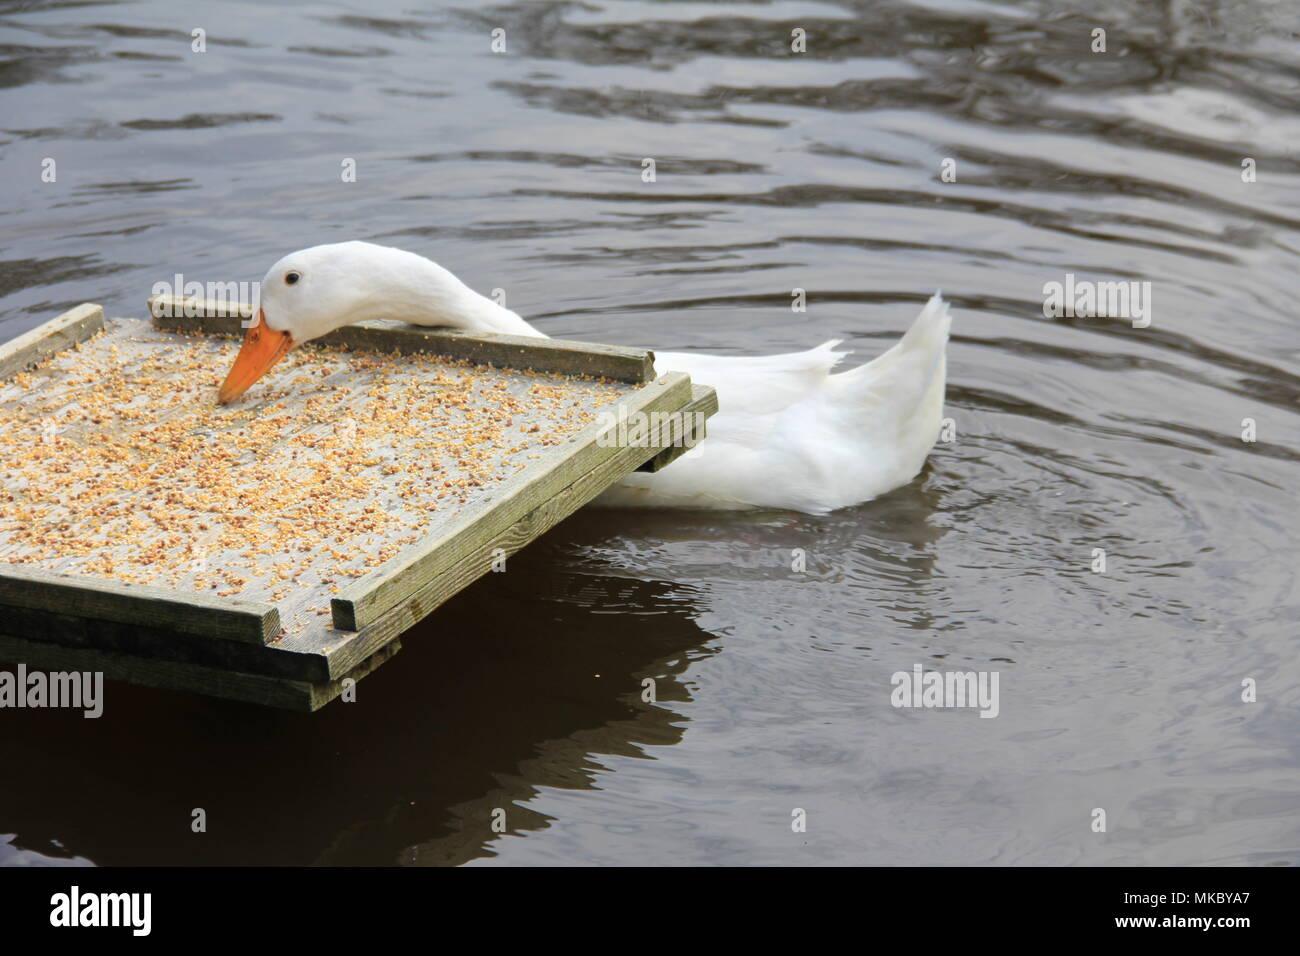 White ducks - Stock Image